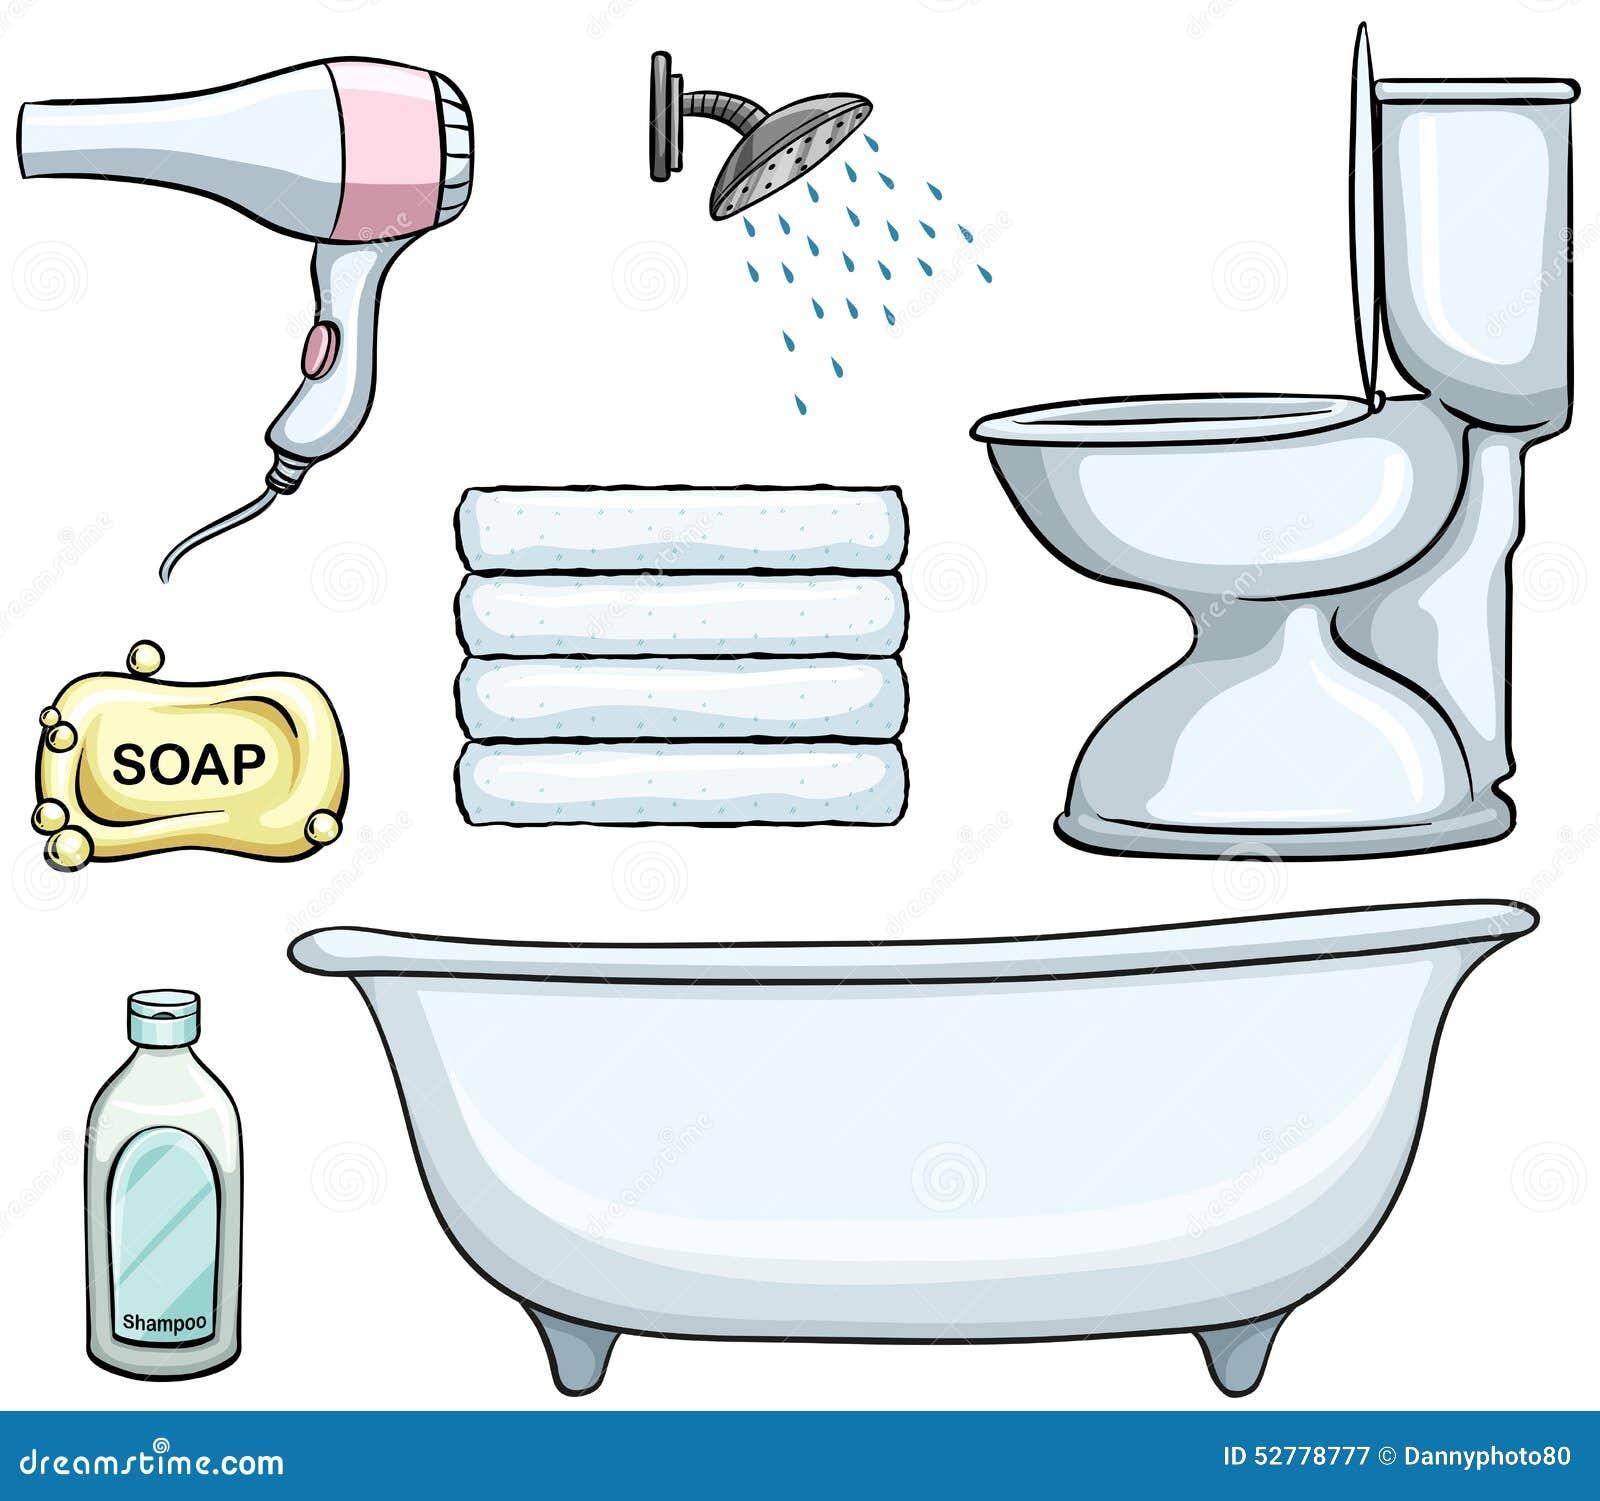 Bathroom Designers Bathroom Objects Stock Vector Image 52778777